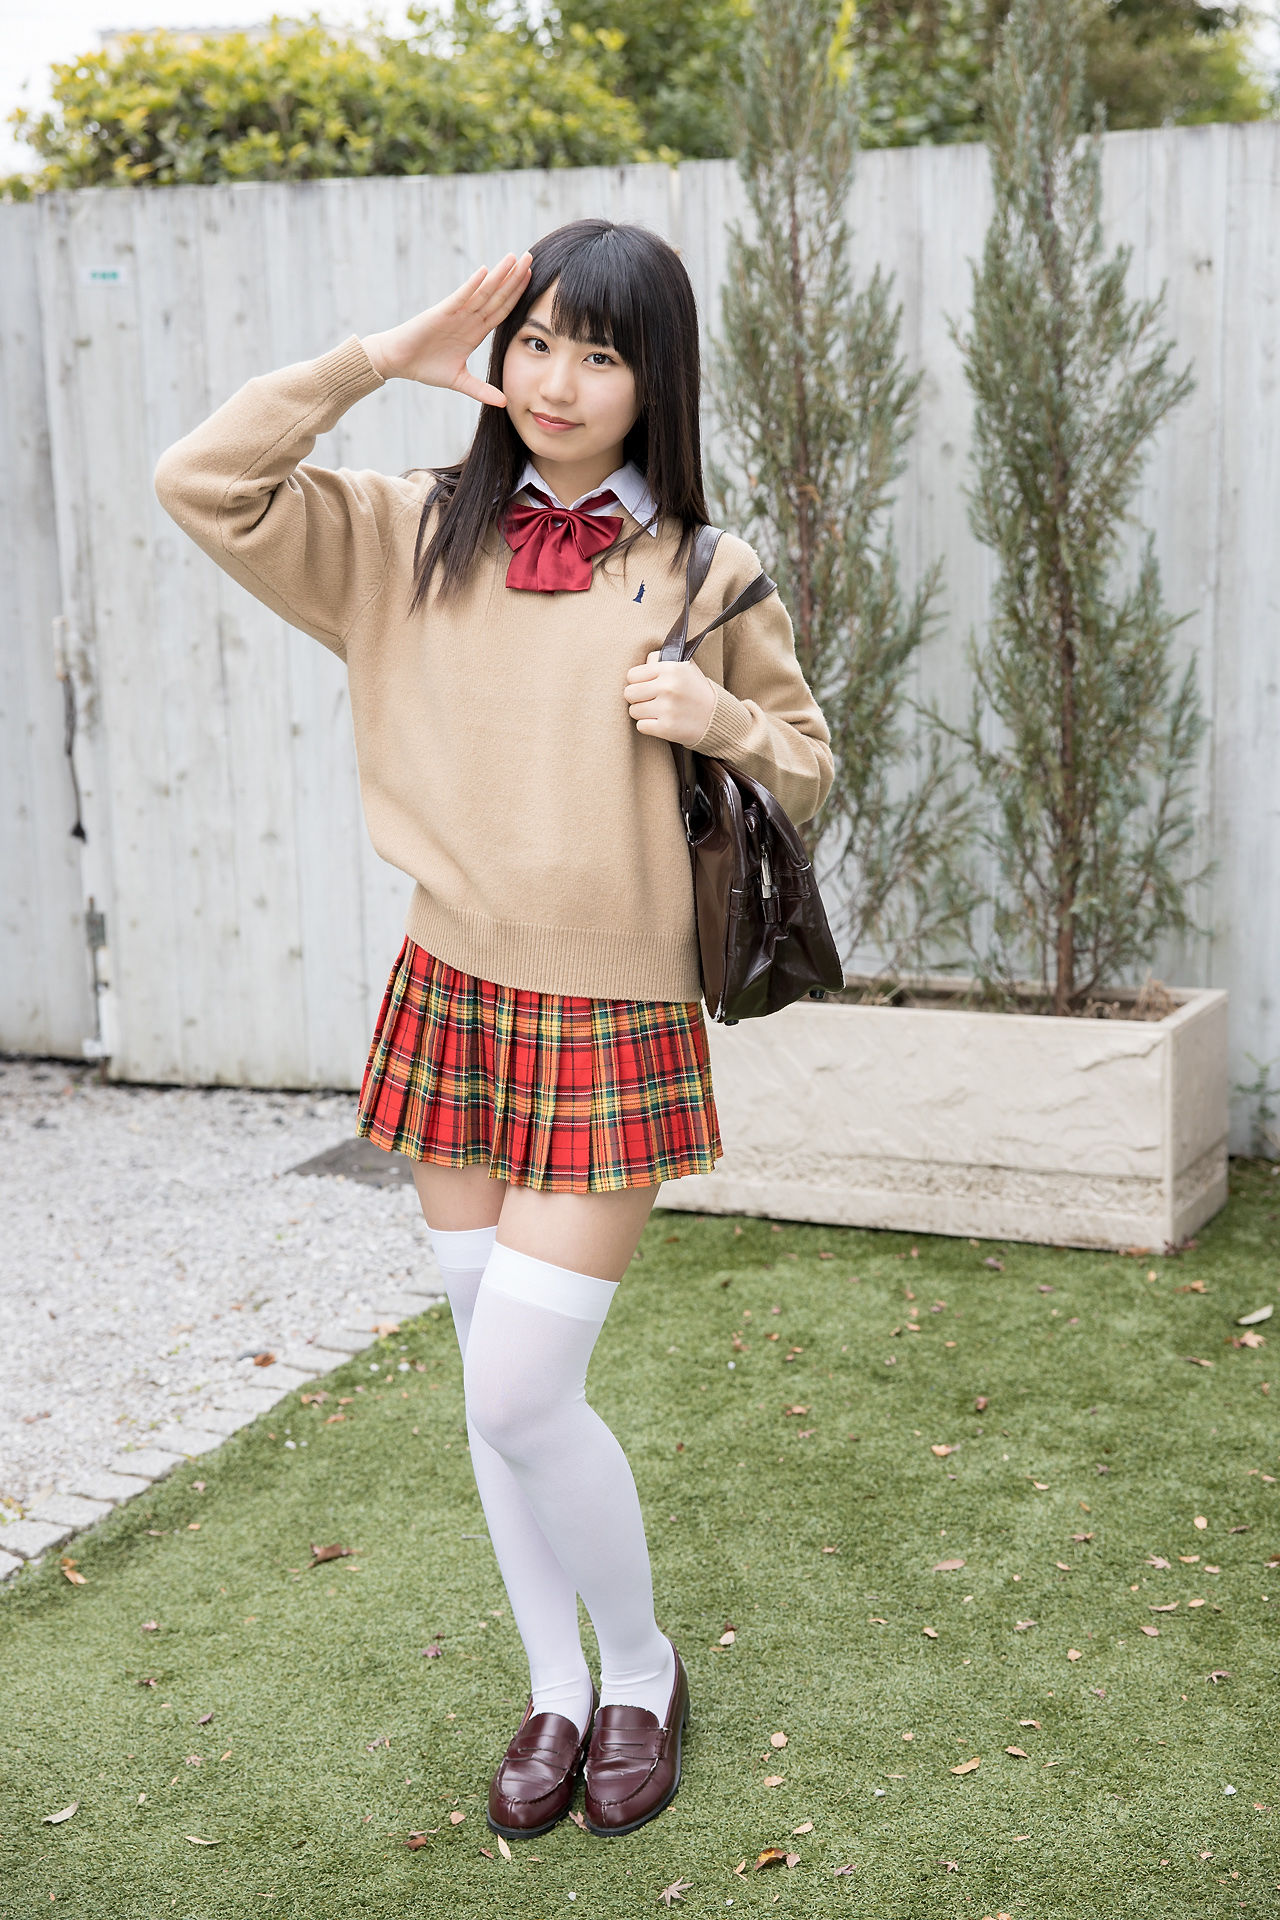 VOL.621 [Minisuka.tv]校服清纯少女:宫丸くるみ(宮丸くるみ)超高清写真套图(50P)